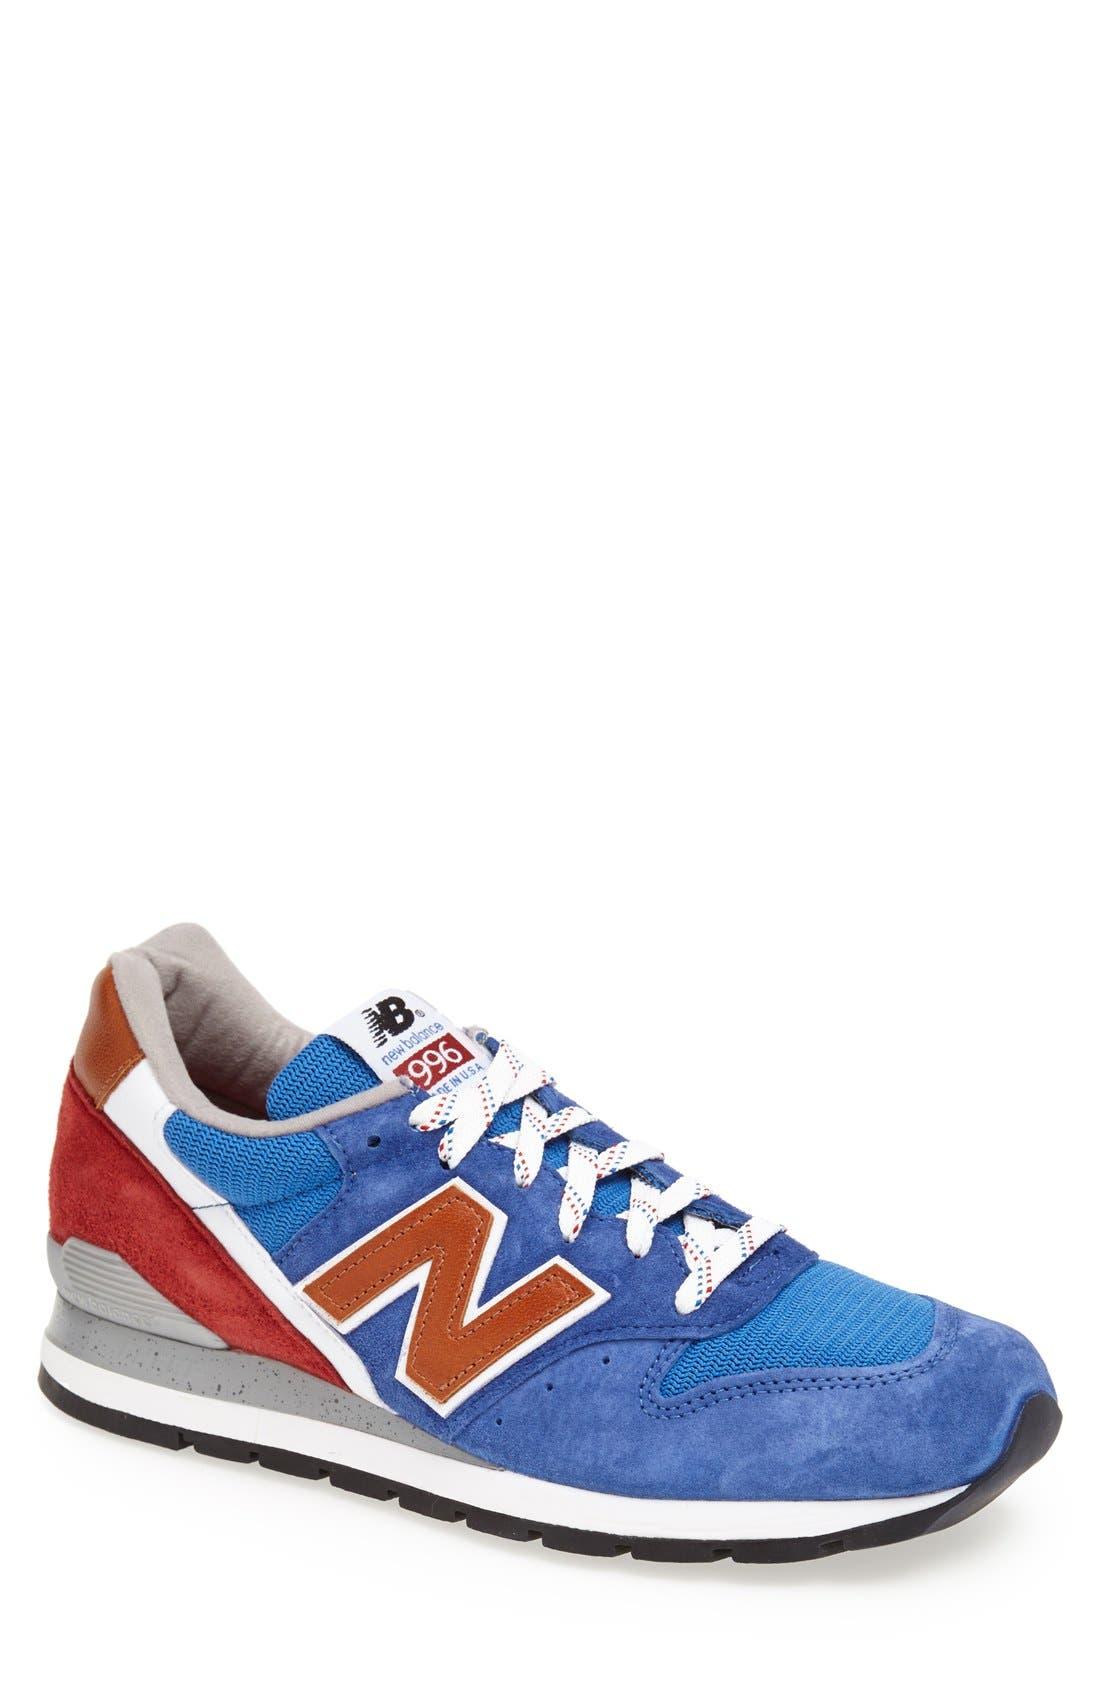 Alternate Image 1 Selected - New Balance '996' Sneaker (Men)